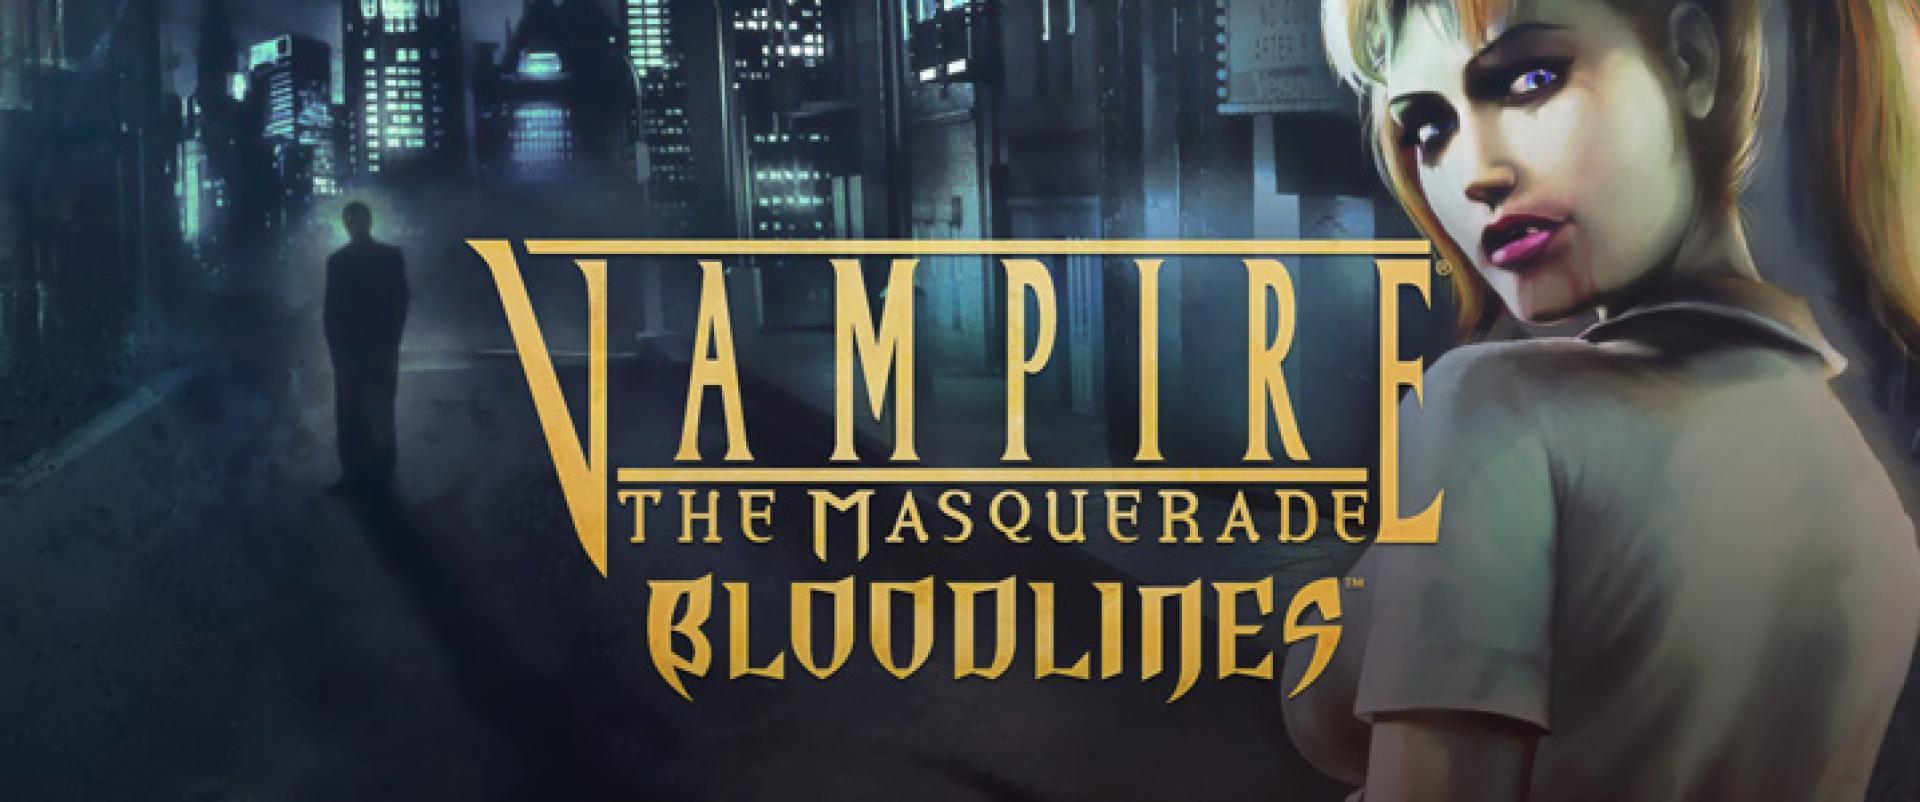 Vampire: The Masquerade - Bloodlines (2004)